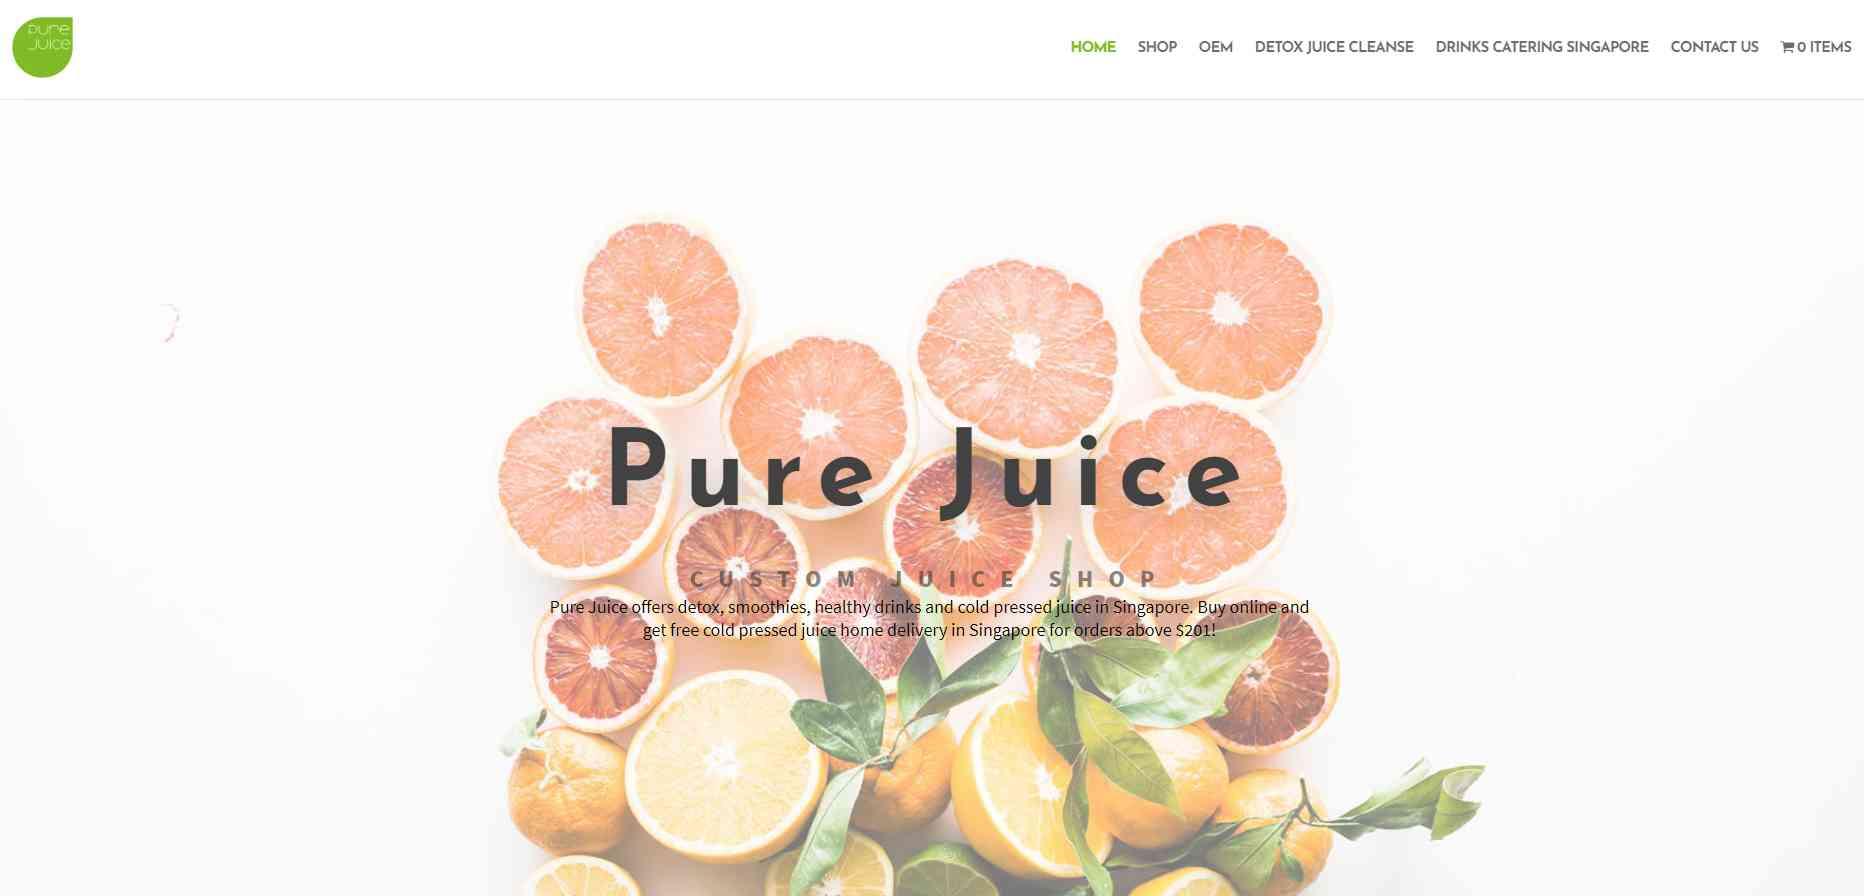 pure juice Top Juice Retailers in Singapore